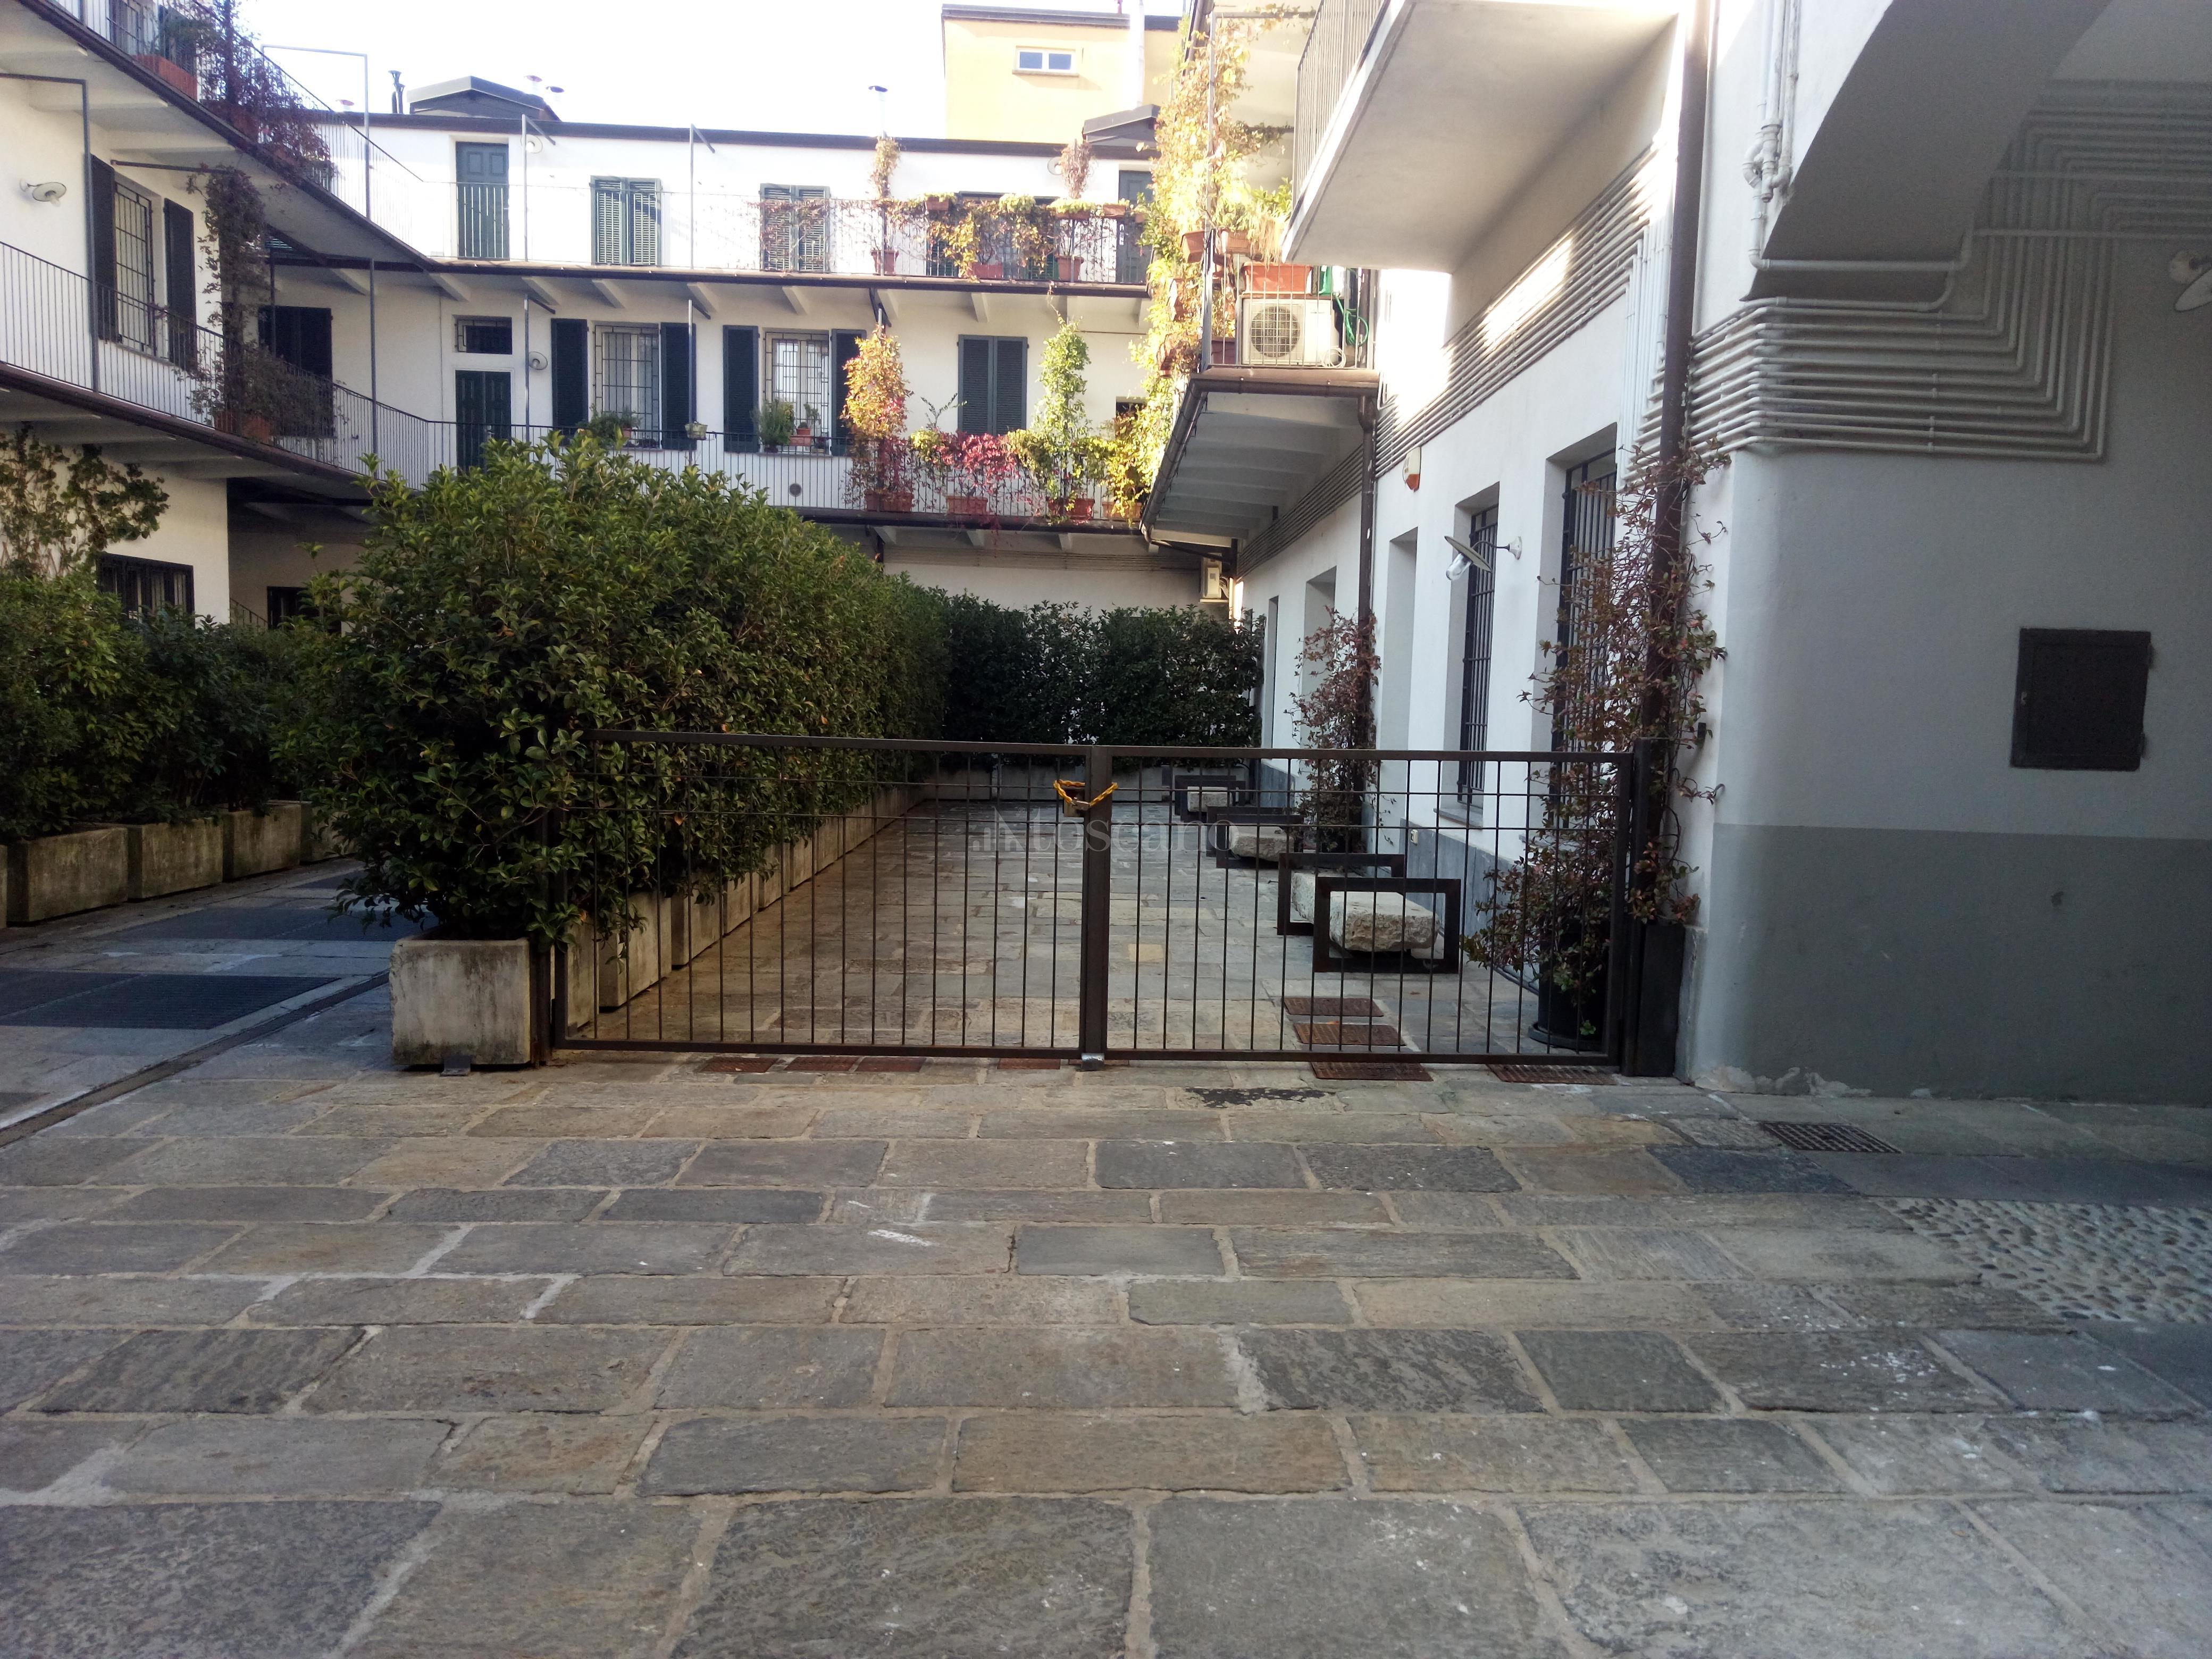 vendita Ufficio a Milano in via Vigevano , Porta Genova 65/2017 ...